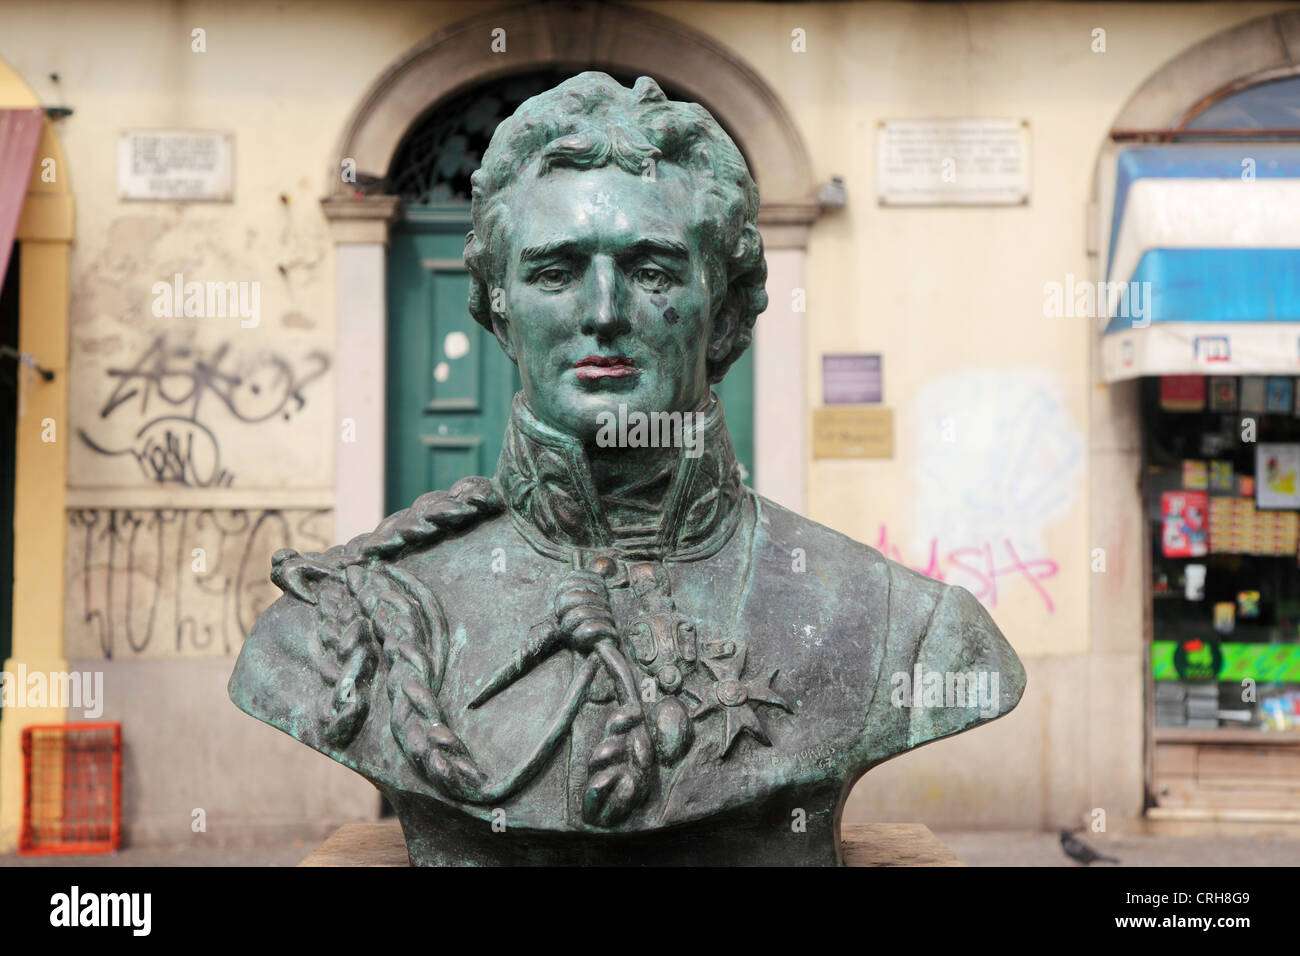 Bust of Arthur Wellesley, the Duke of Wellington, in Porto, Portugal. - Stock Image